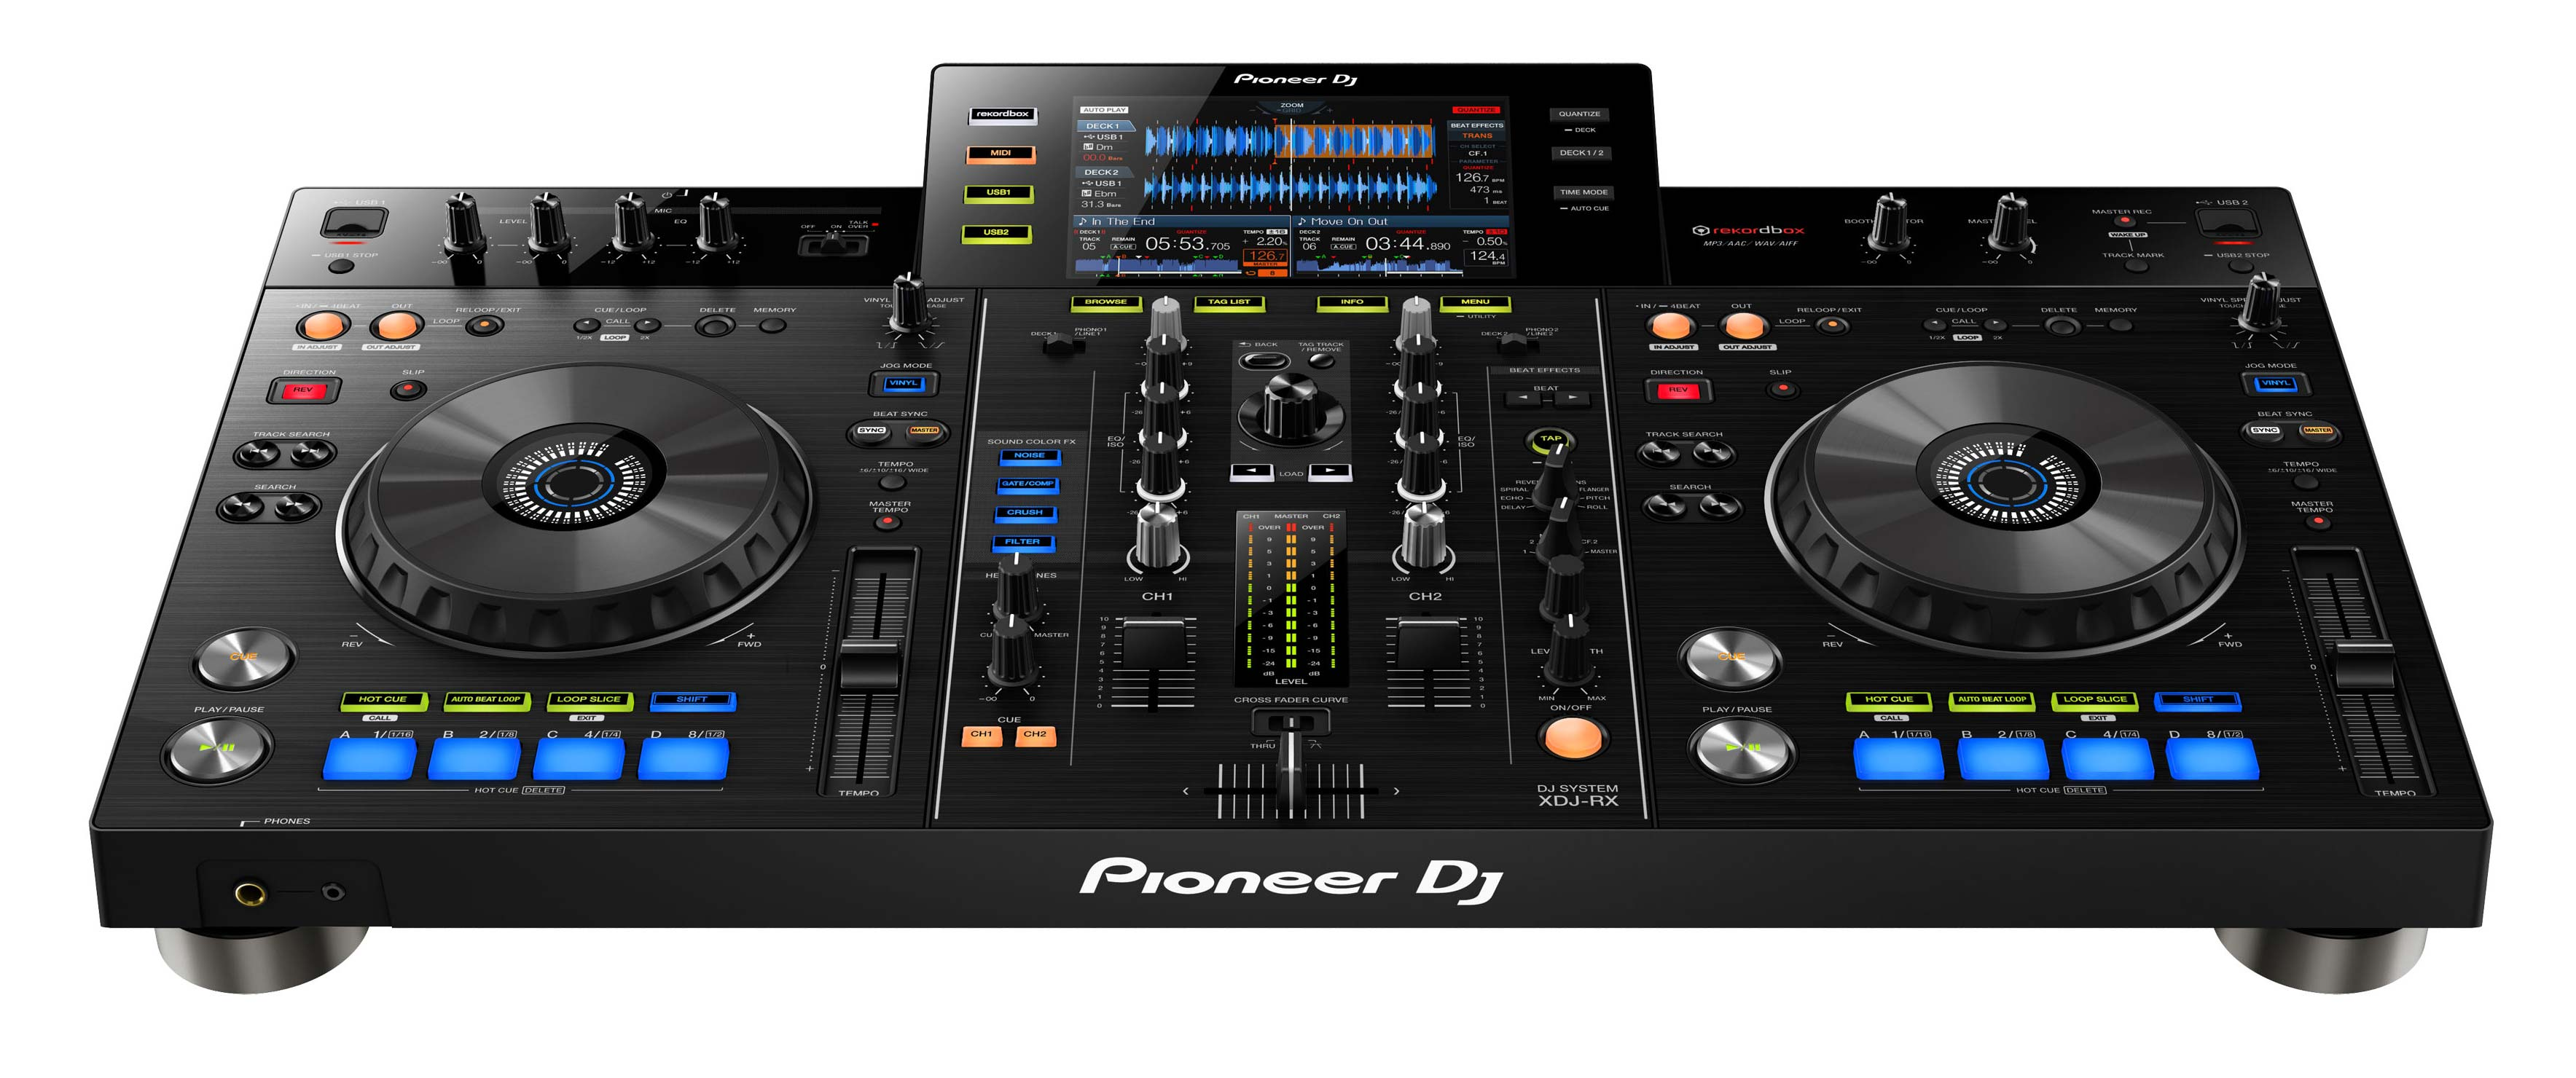 [MÜÜA] Pioneer XDJ-RX DJ Kontroller Pioneer-xdj-rx